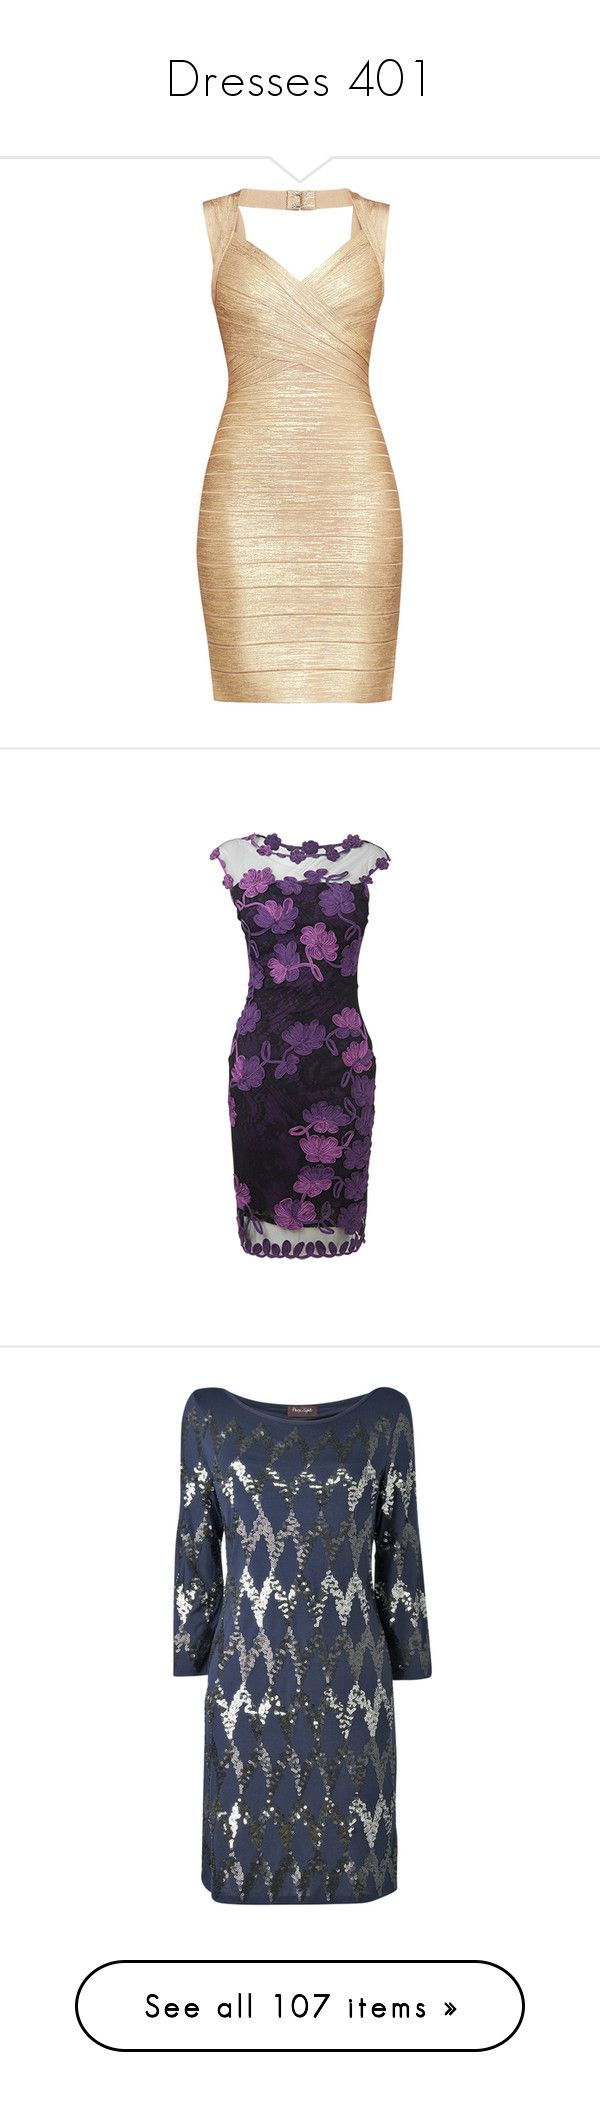 """Dresses 401"" by singlemom ❤ liked on Polyvore featuring dresses, bandage dresses, bandage cocktail dresses, beige bandage dress, beige cocktail dress, shimmer dress, long sleeve cocktail dresses, metallic dresses, zigzag dress and metallic sequin dress"